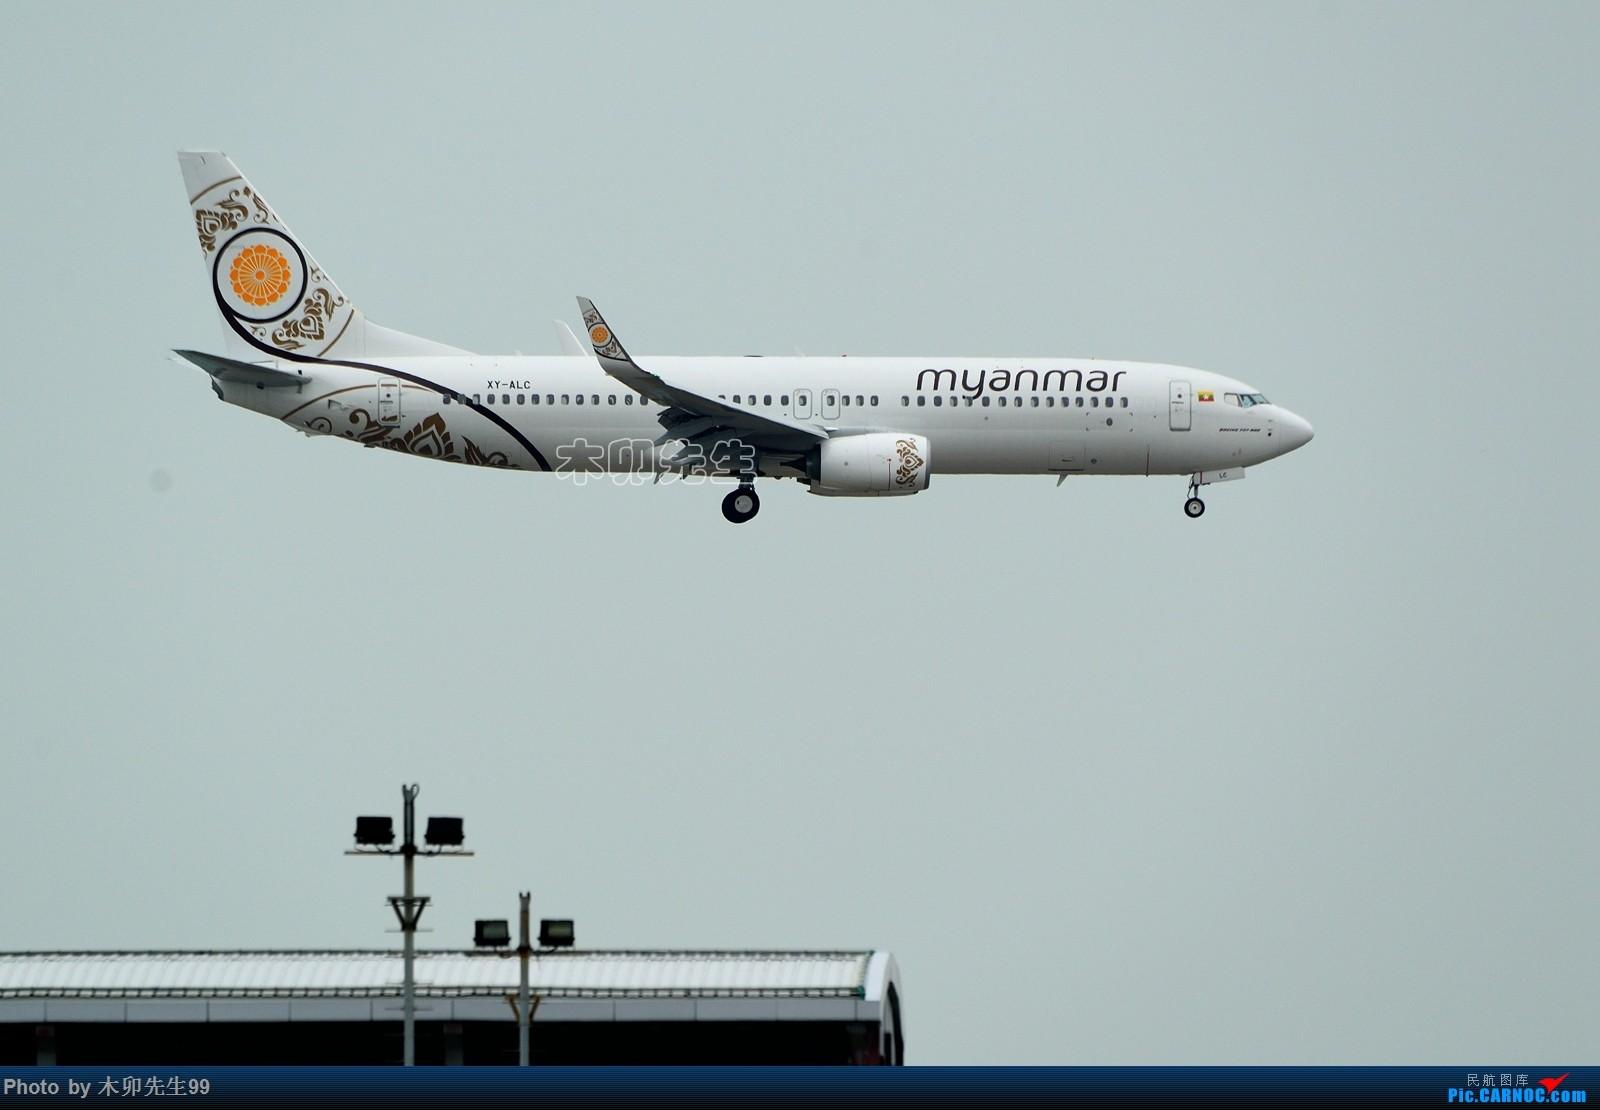 "Re:[原创]]【木卯先生99】—香港拍机第一次拍到—004-5【两年多今天第一次拍摄到缅甸航空飞机及华信航空""花现台中""彩绘机】1600×1066>>帖子列表 BOEING 737-800 XY-ALC 香港国际机场"